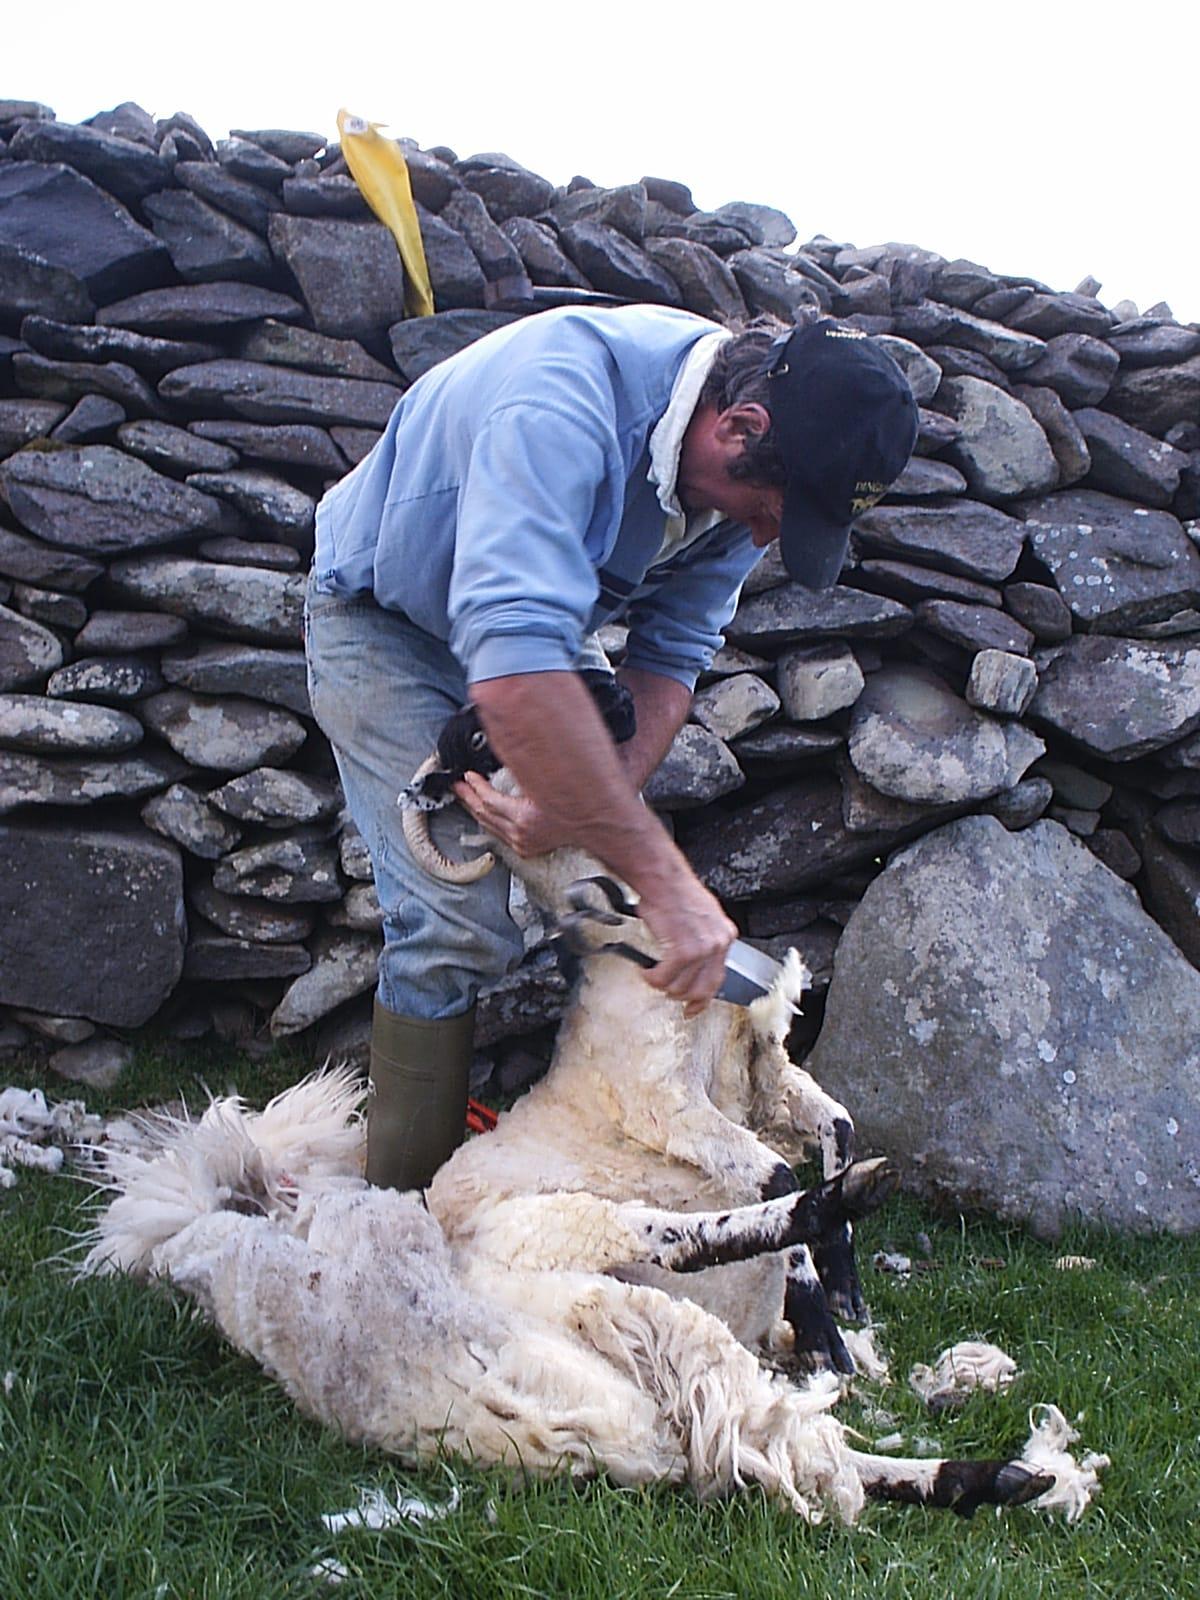 Sheep shearing old style